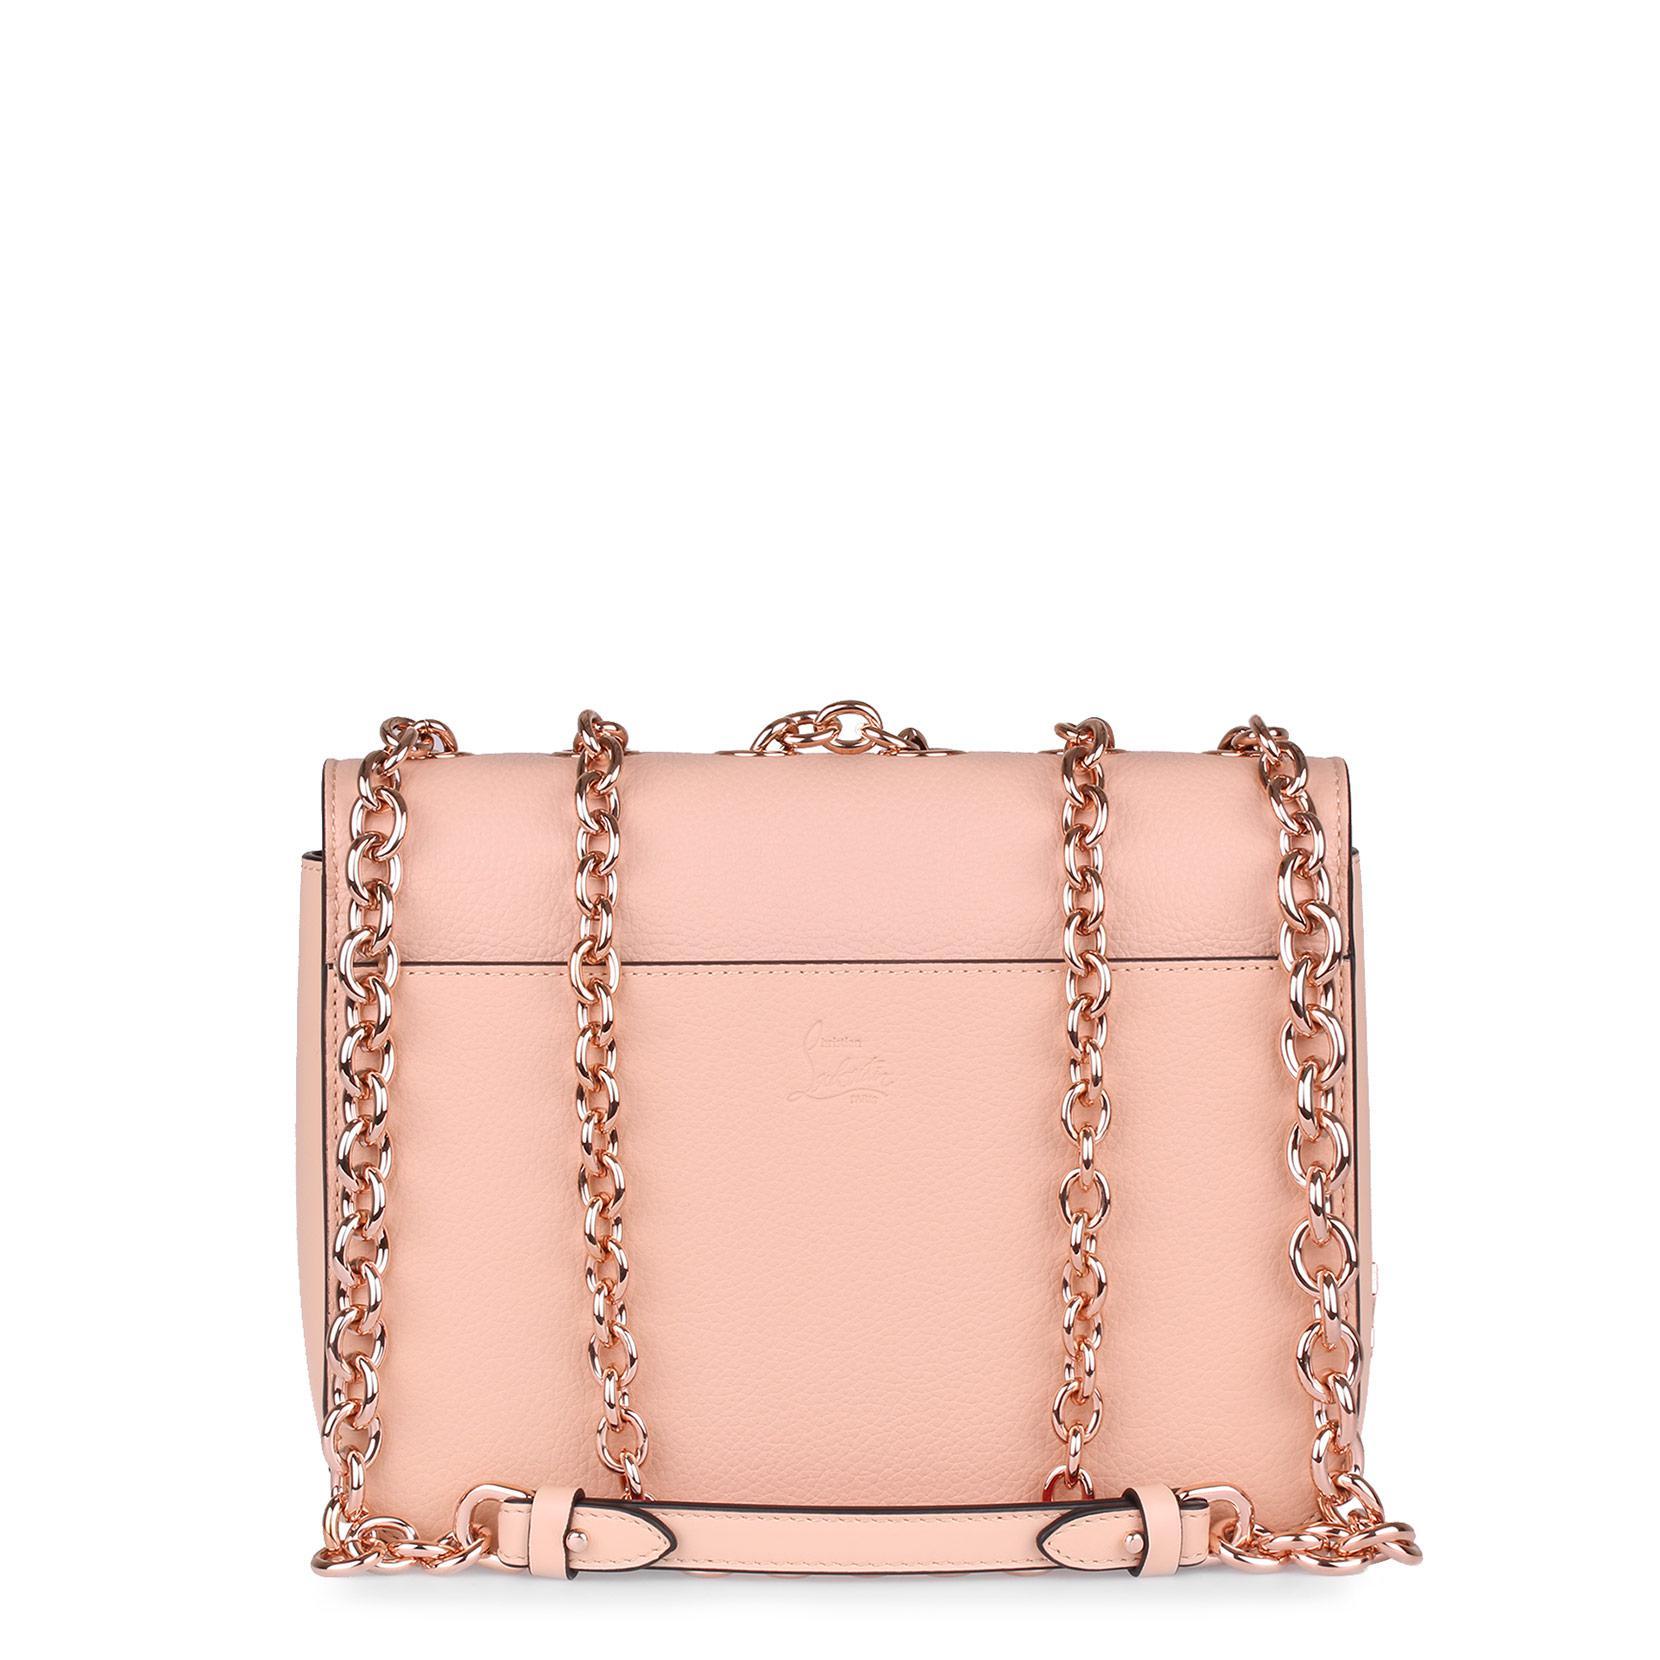 Christian Louboutin Sweet Charity rose gold shoulder bag jlAQs